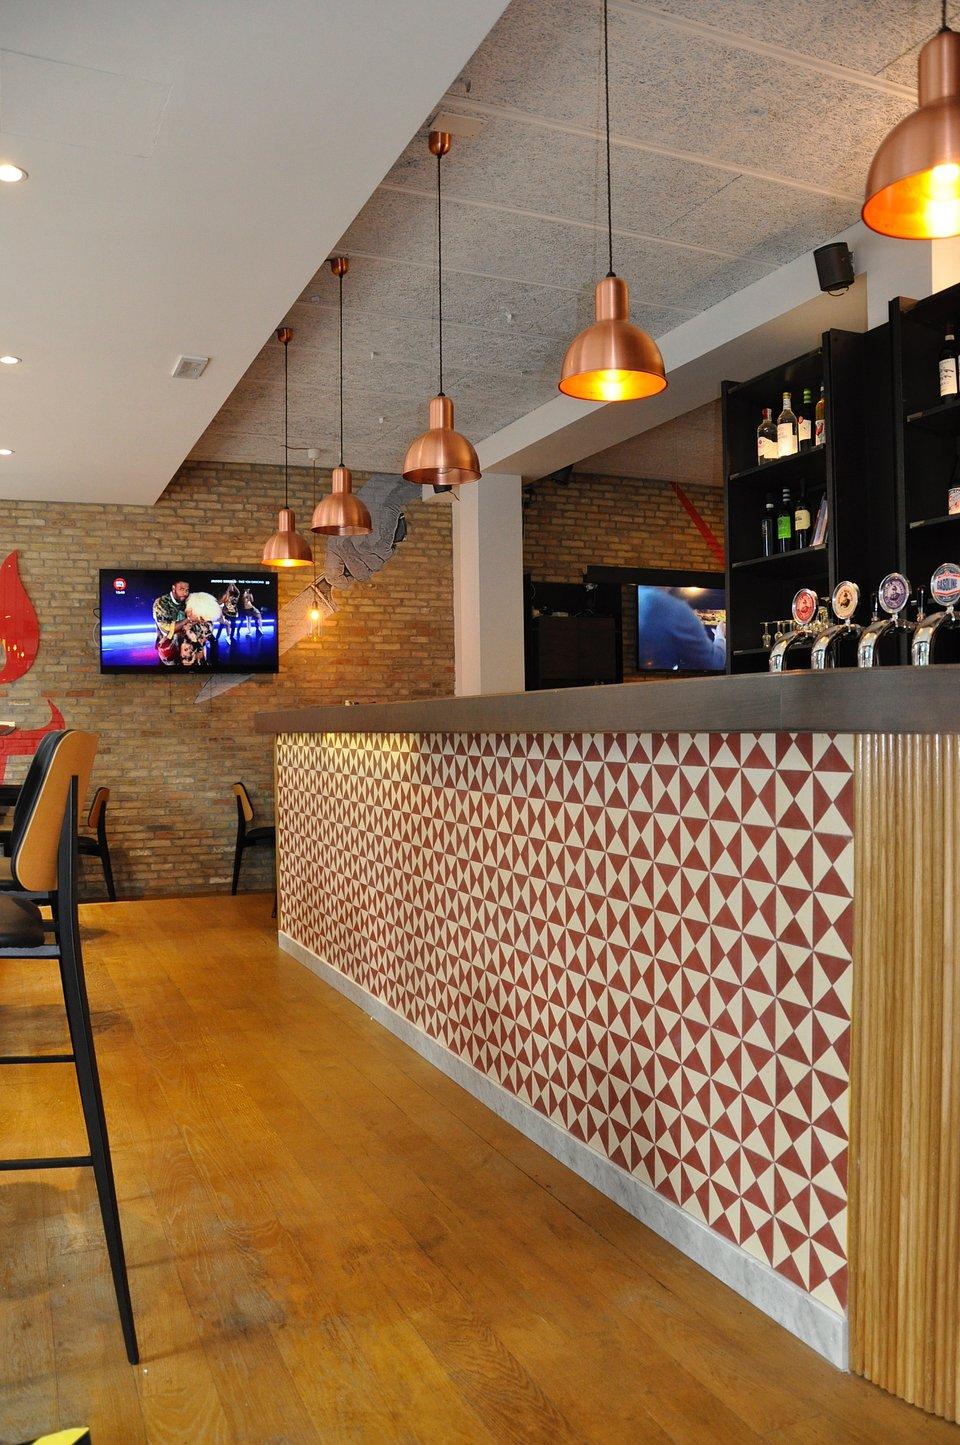 Taglio Restaurant by RPM Proget (5).jpg